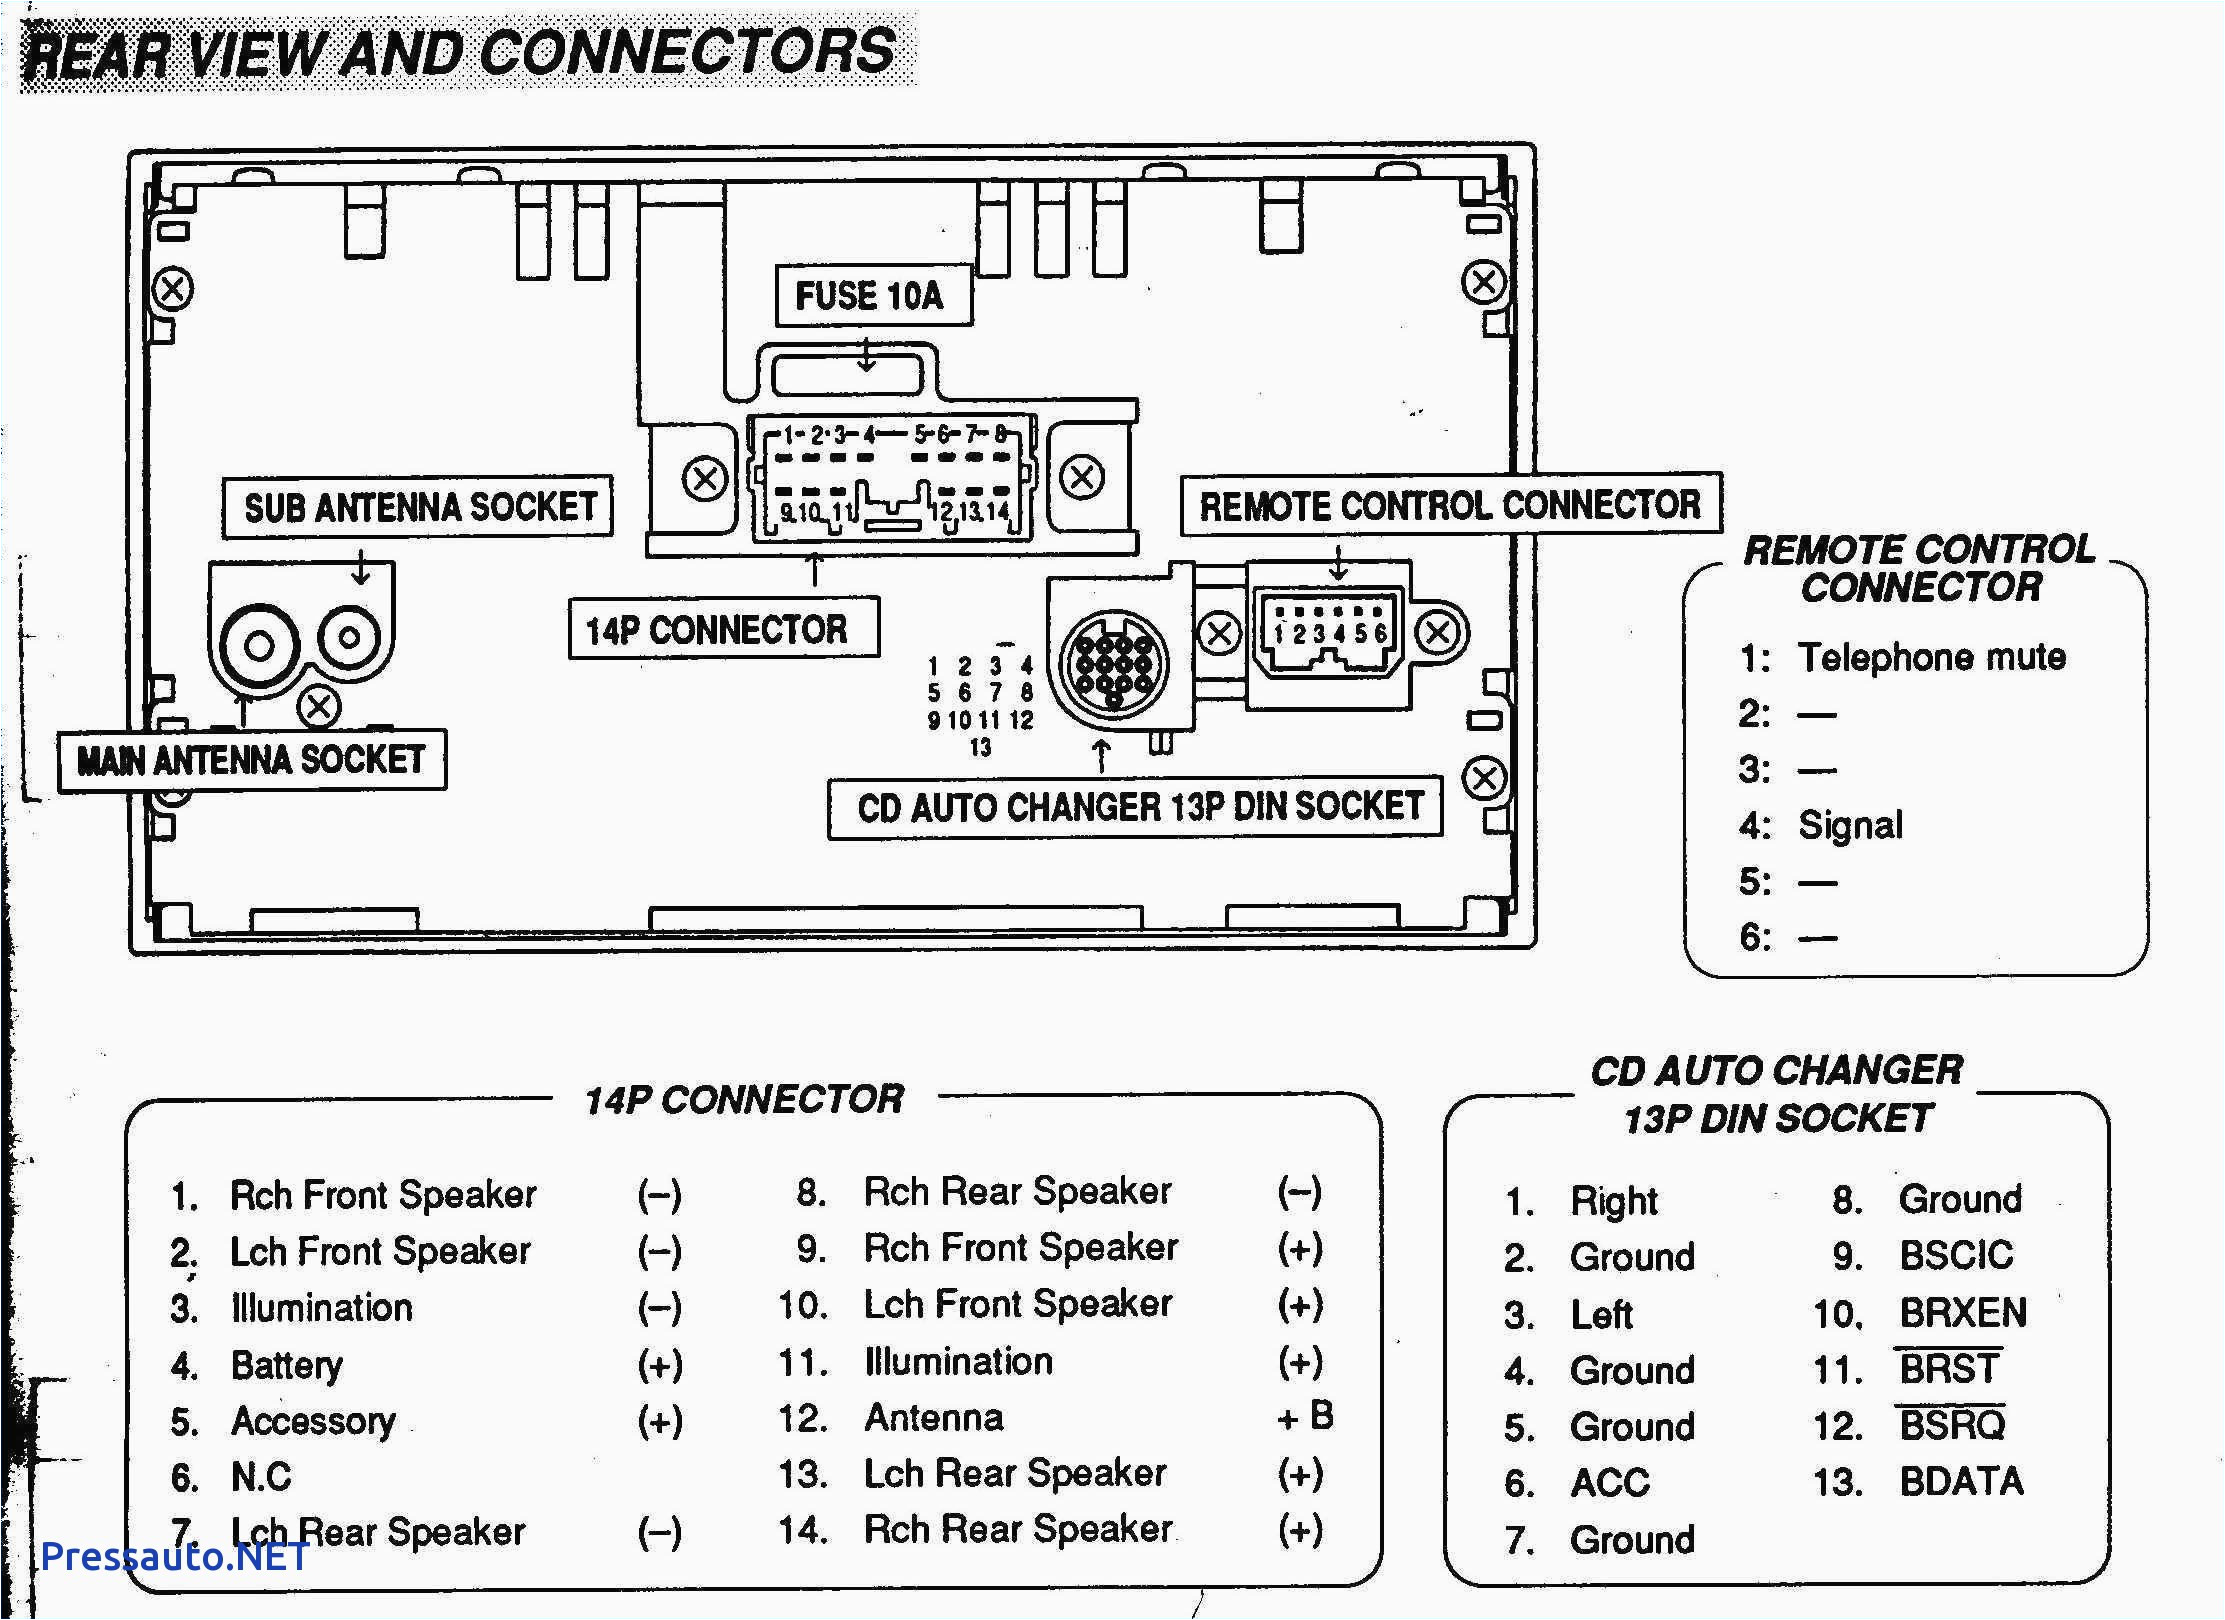 1999 vw beetle radio wiring diagram wiring diagram toolbox 2001 vw beetle radio wiring diagram vw beetle radio wiring diagram